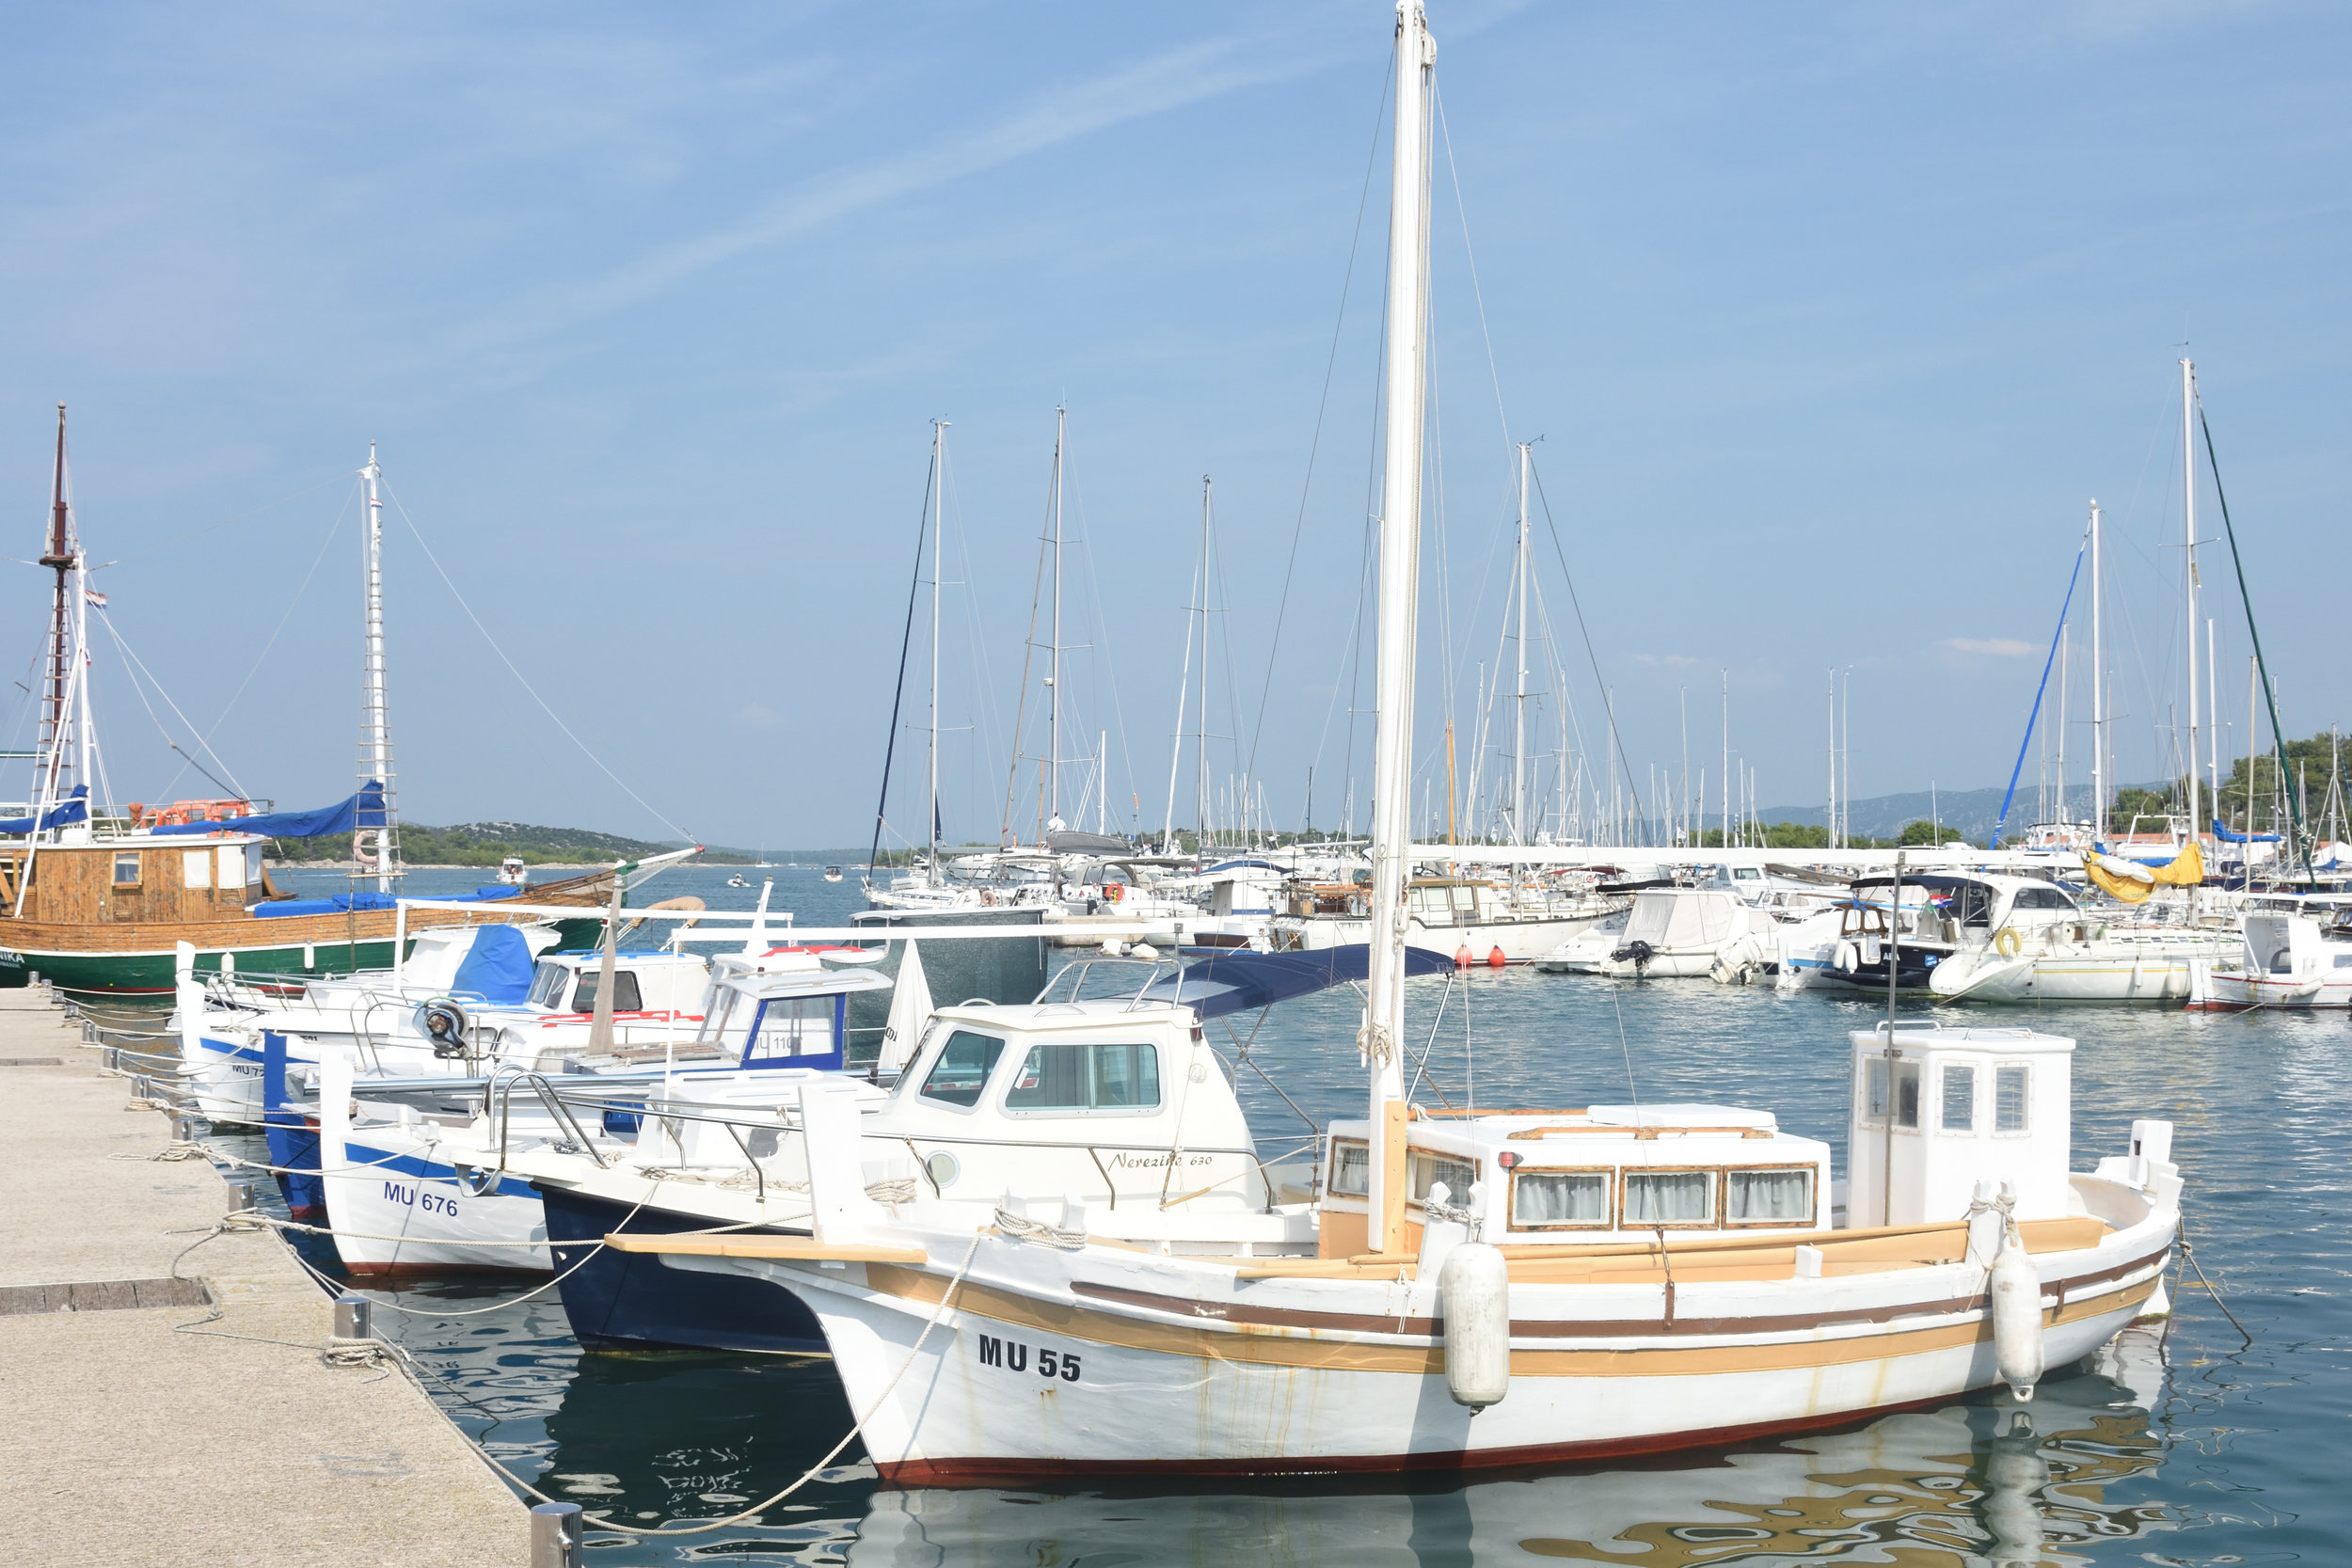 Murter Harbour, Croatia 2016